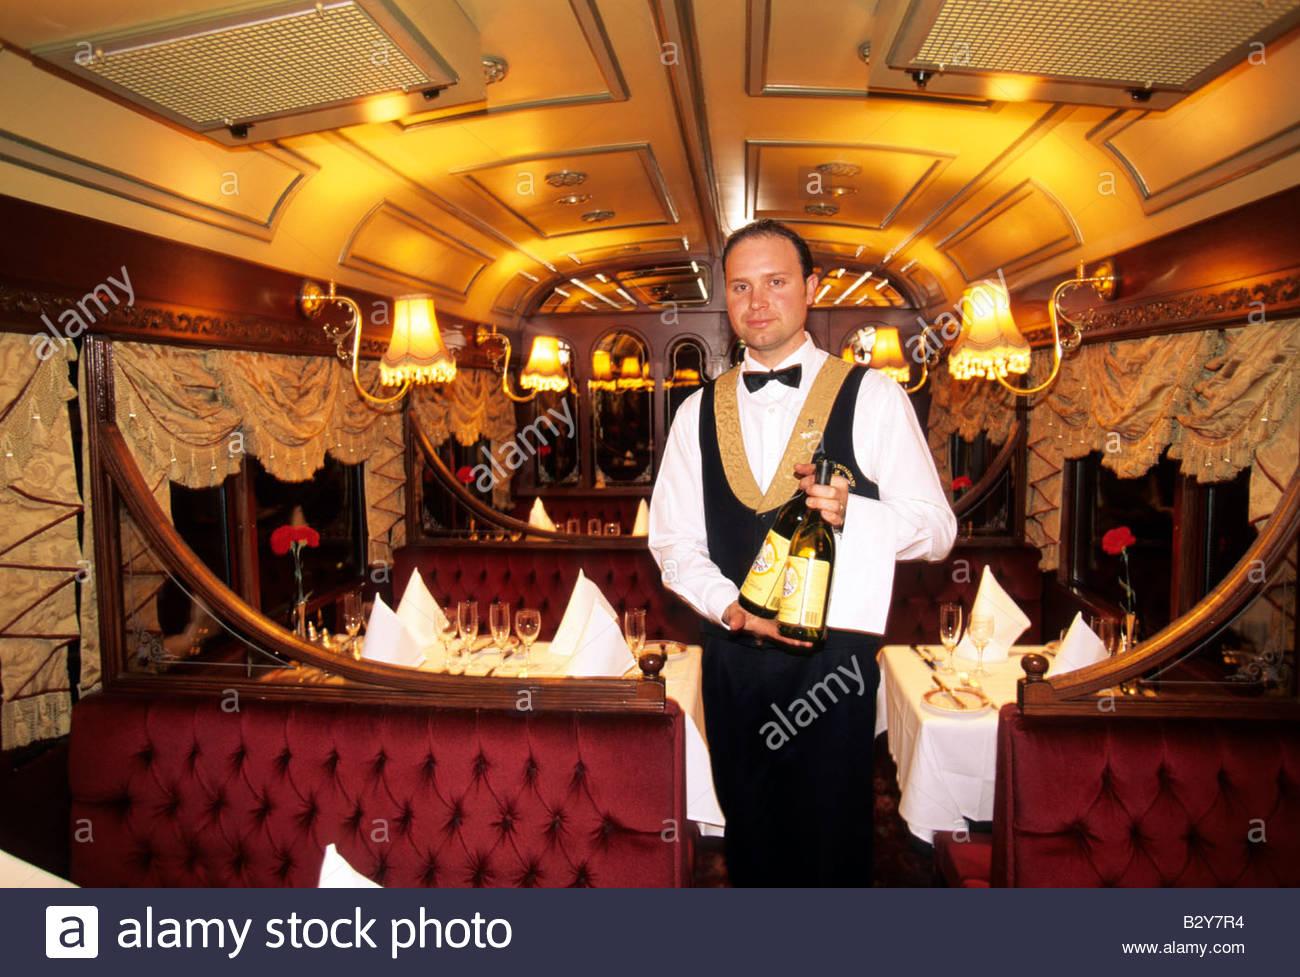 australia melbourne tram restaurant stock photo royalty. Black Bedroom Furniture Sets. Home Design Ideas